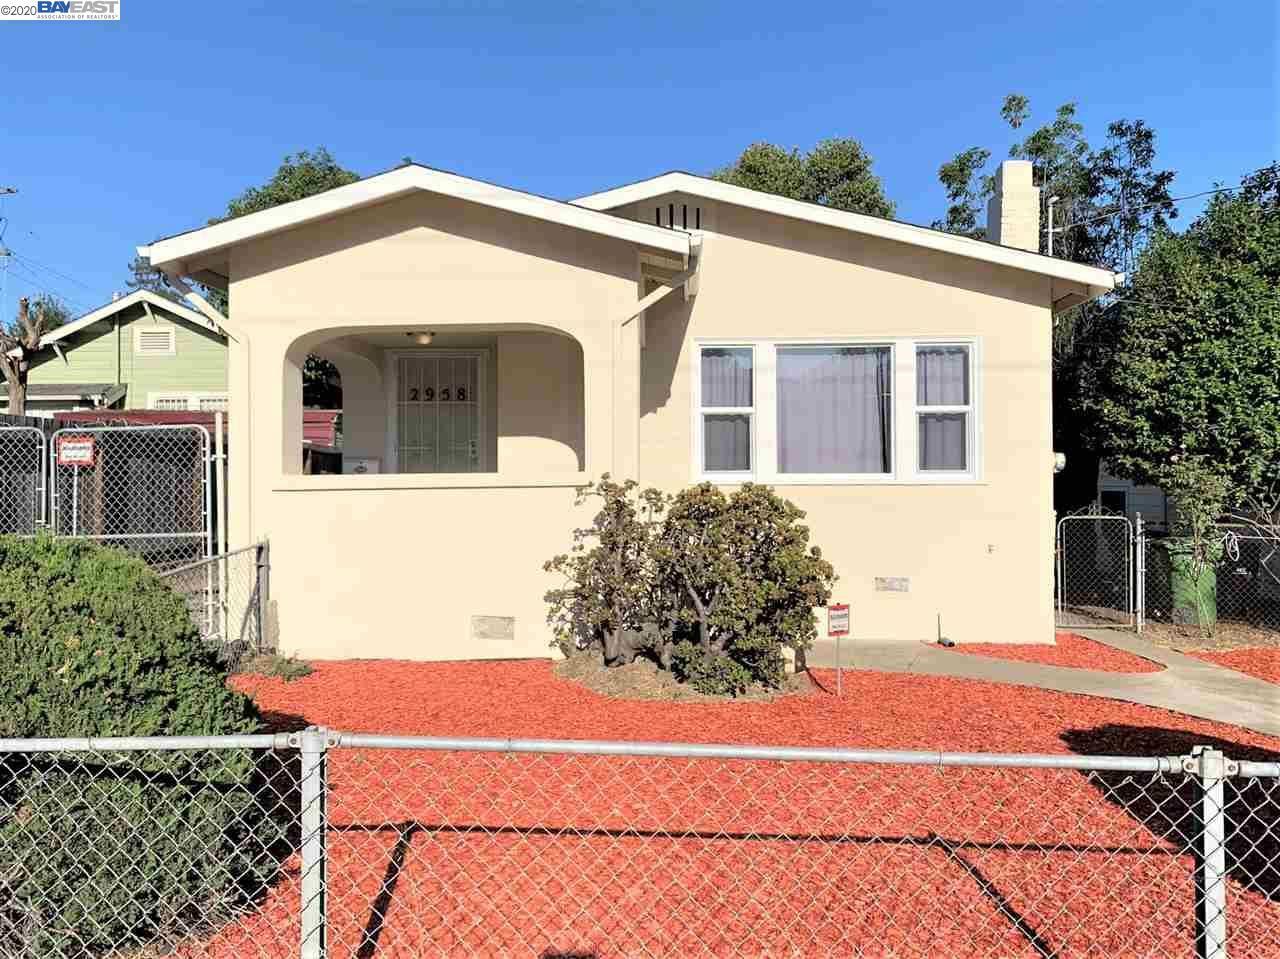 2958 Fruitvale Ave, Oakland, CA 94602 - MLS#: 40911525